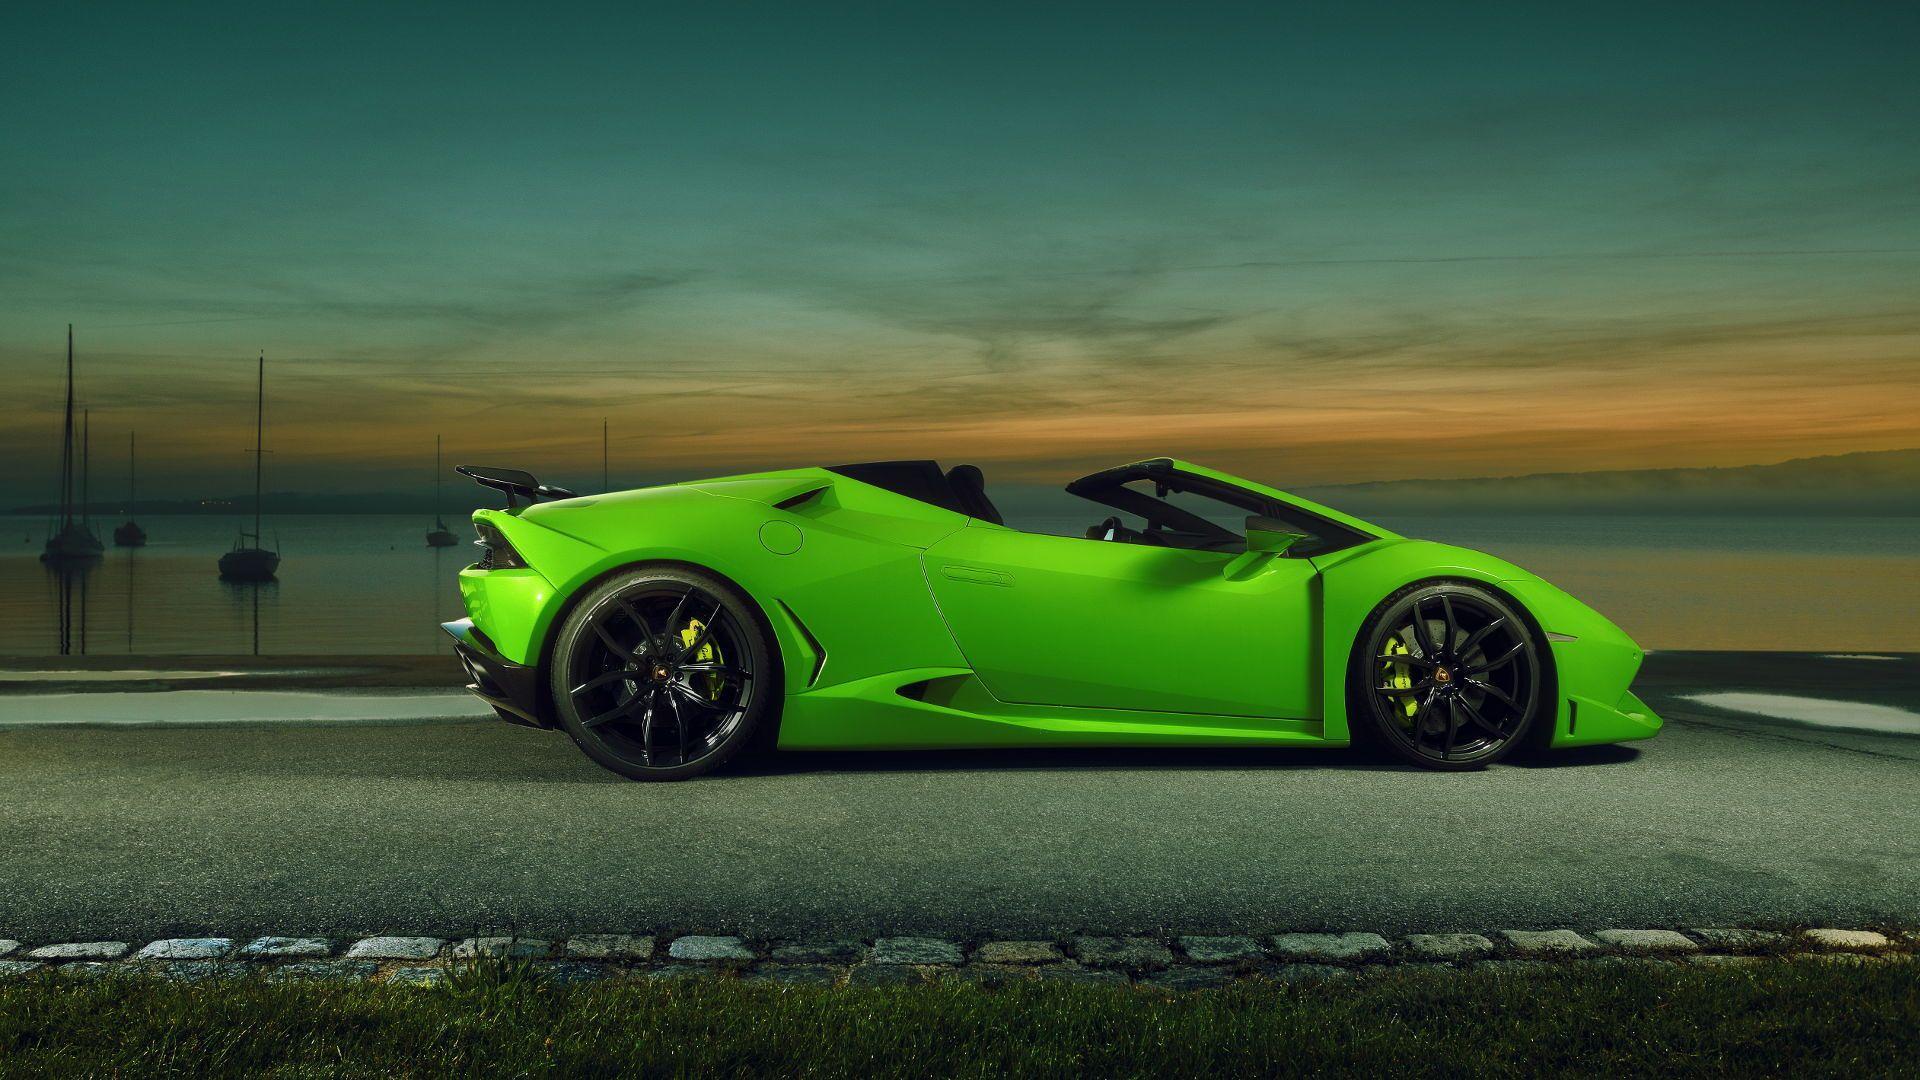 Widebody Lamborghini Huracan Spyder By Novitec Has 860 HP